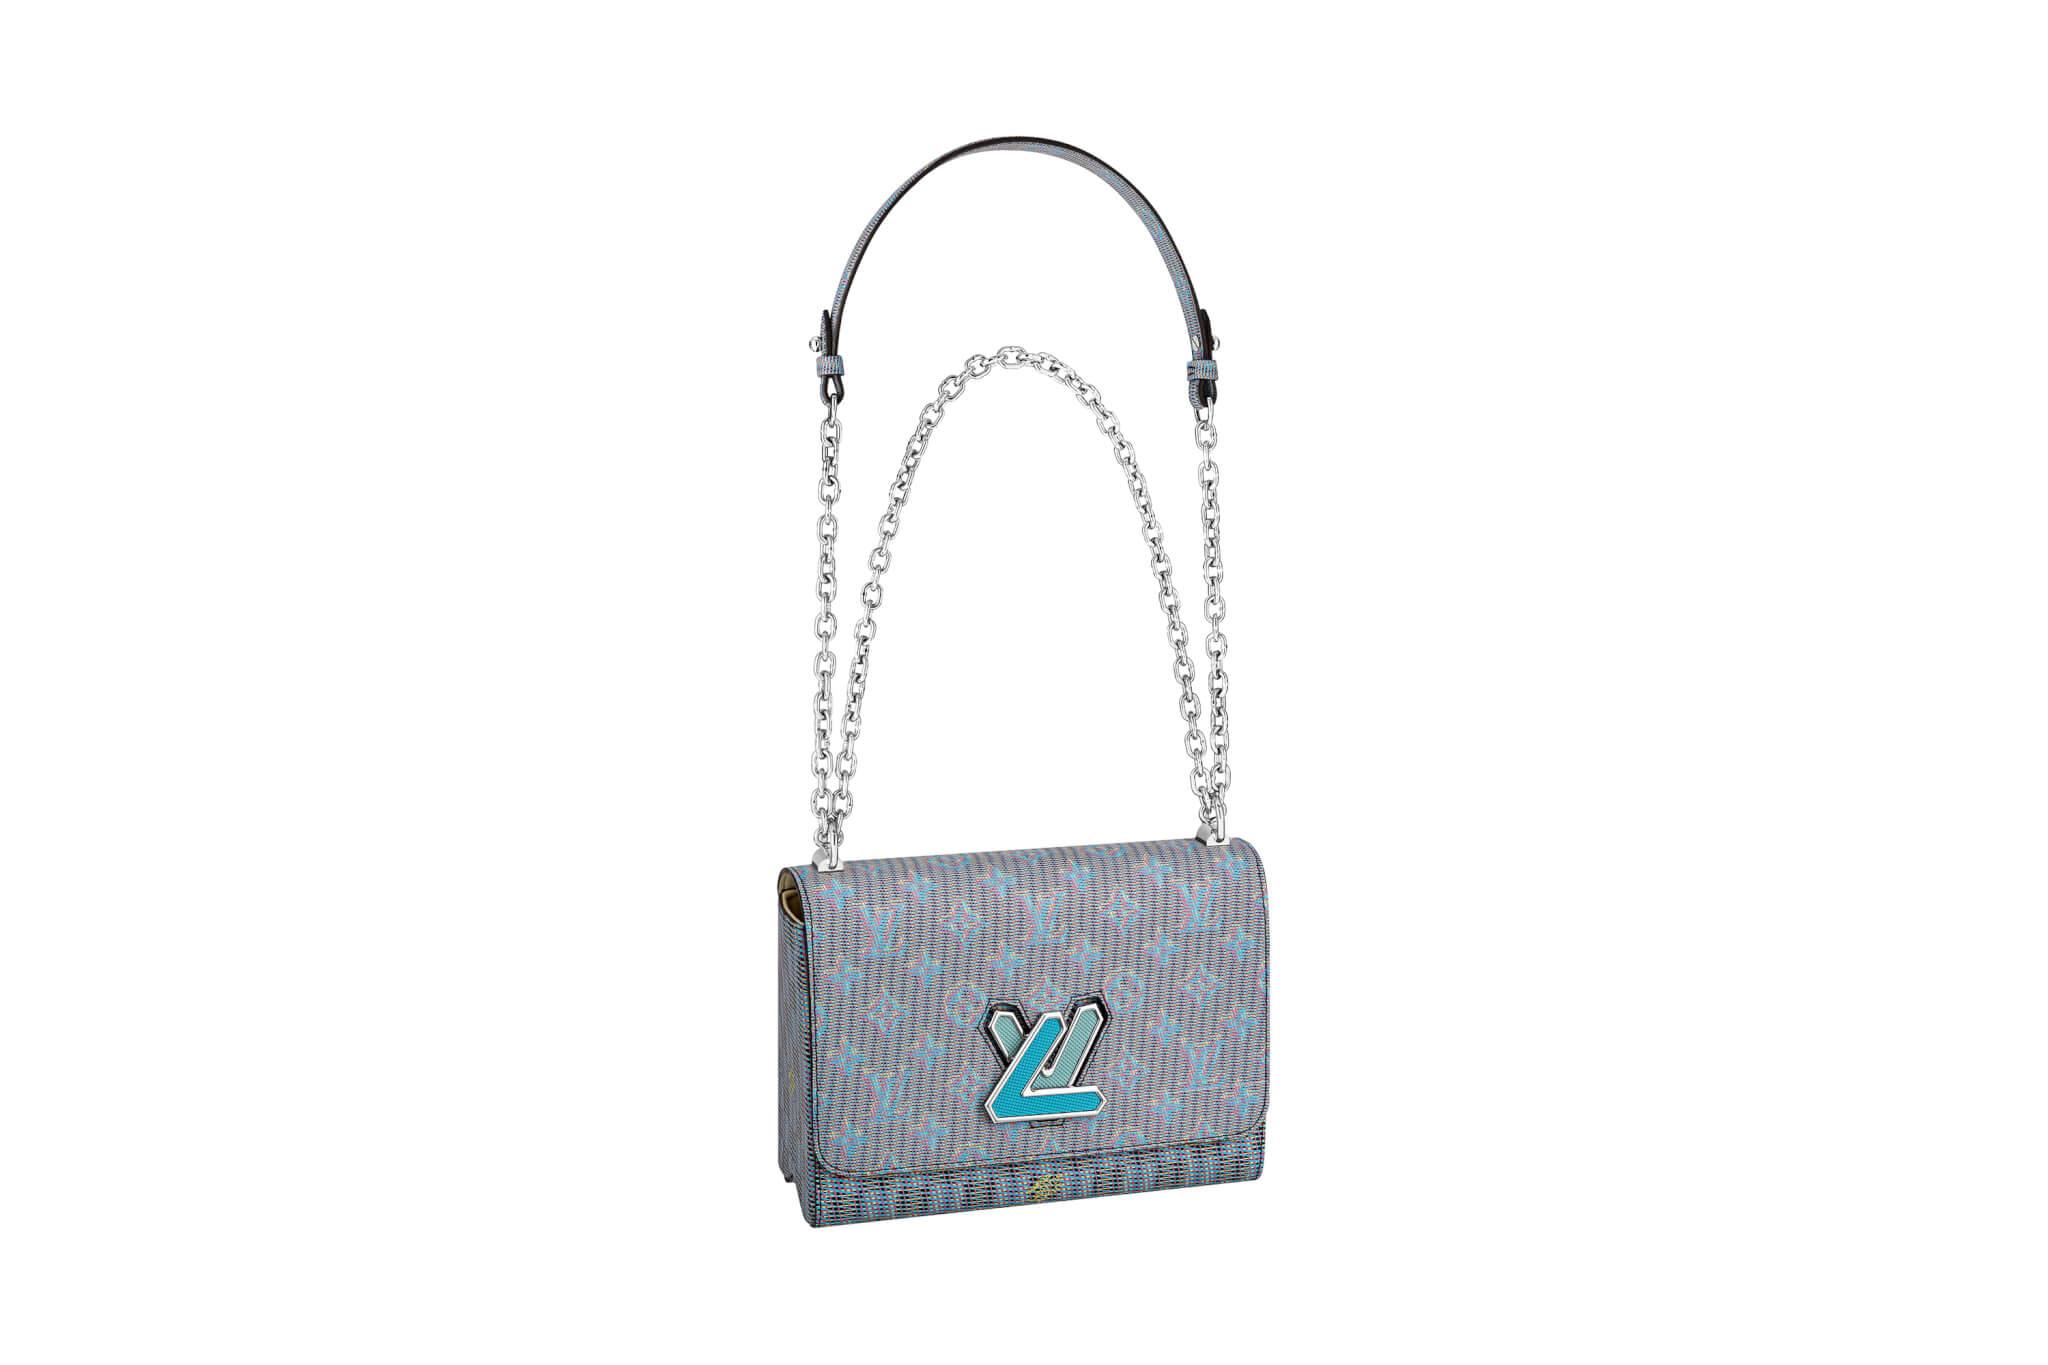 twist-monogram-and-damier-lv-pop-blue-hk33000m55480